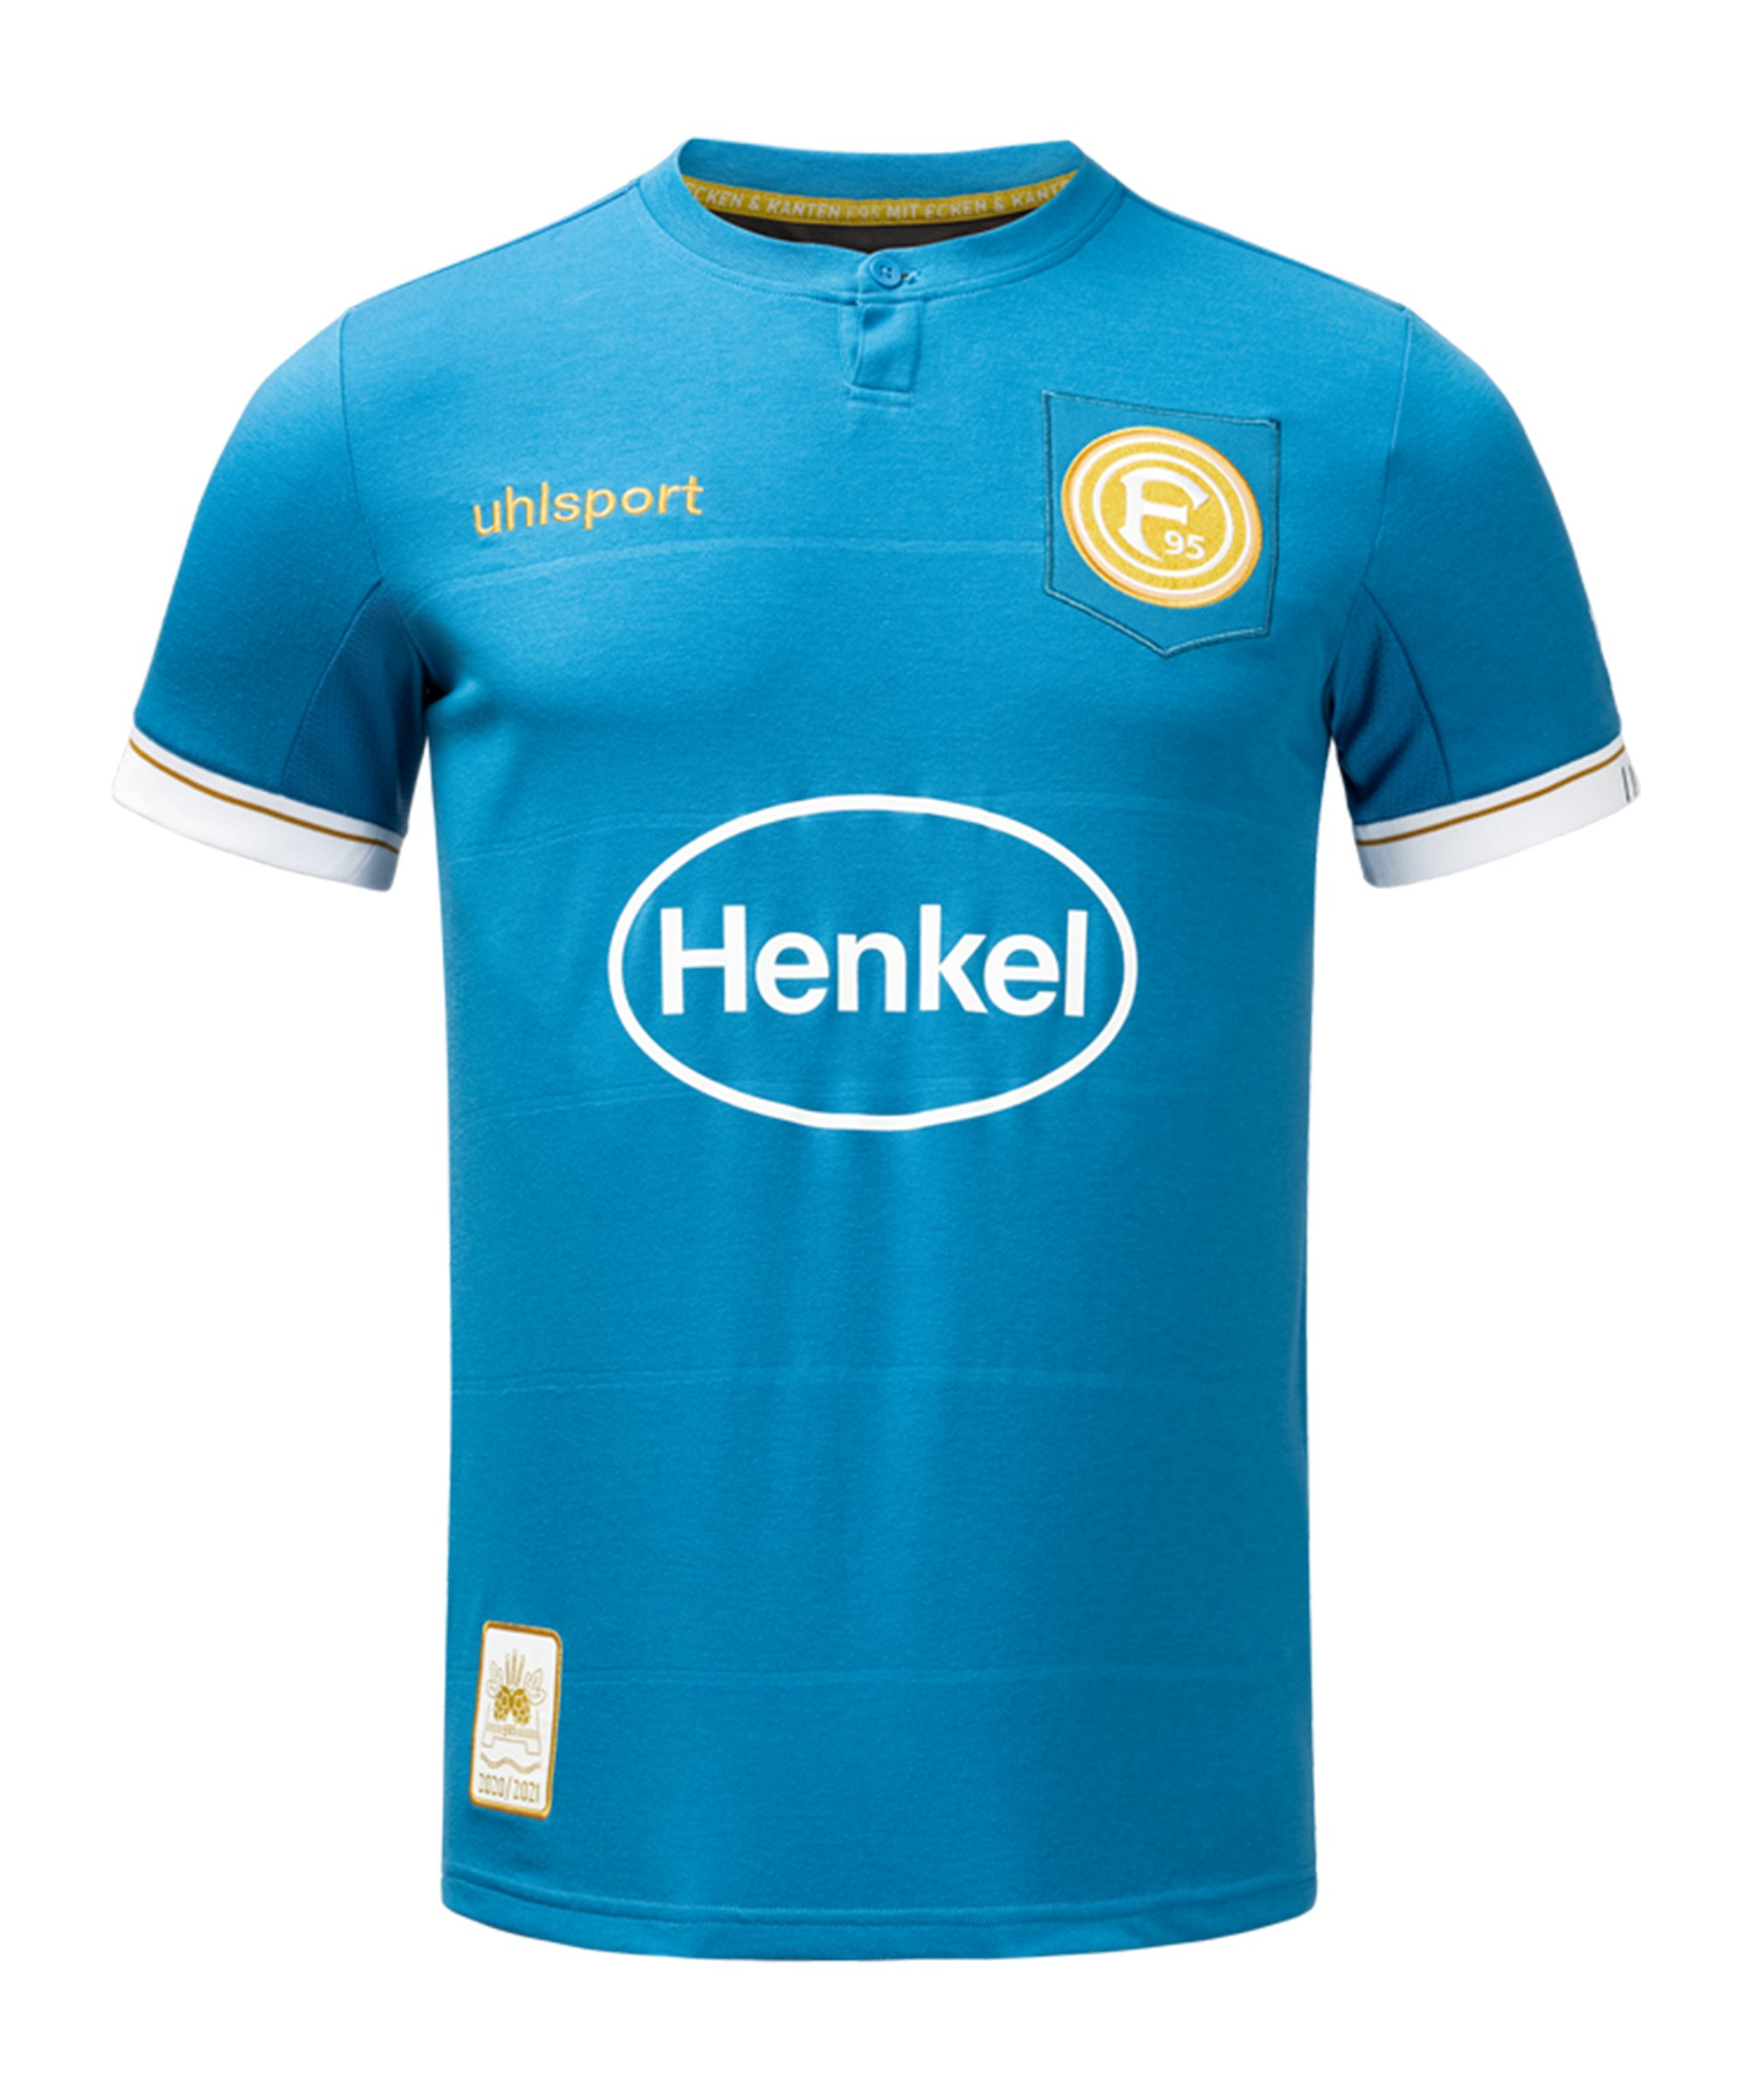 Uhlsport Fortuna Düsseldorf Sondertrikot 2020/2021 - blau